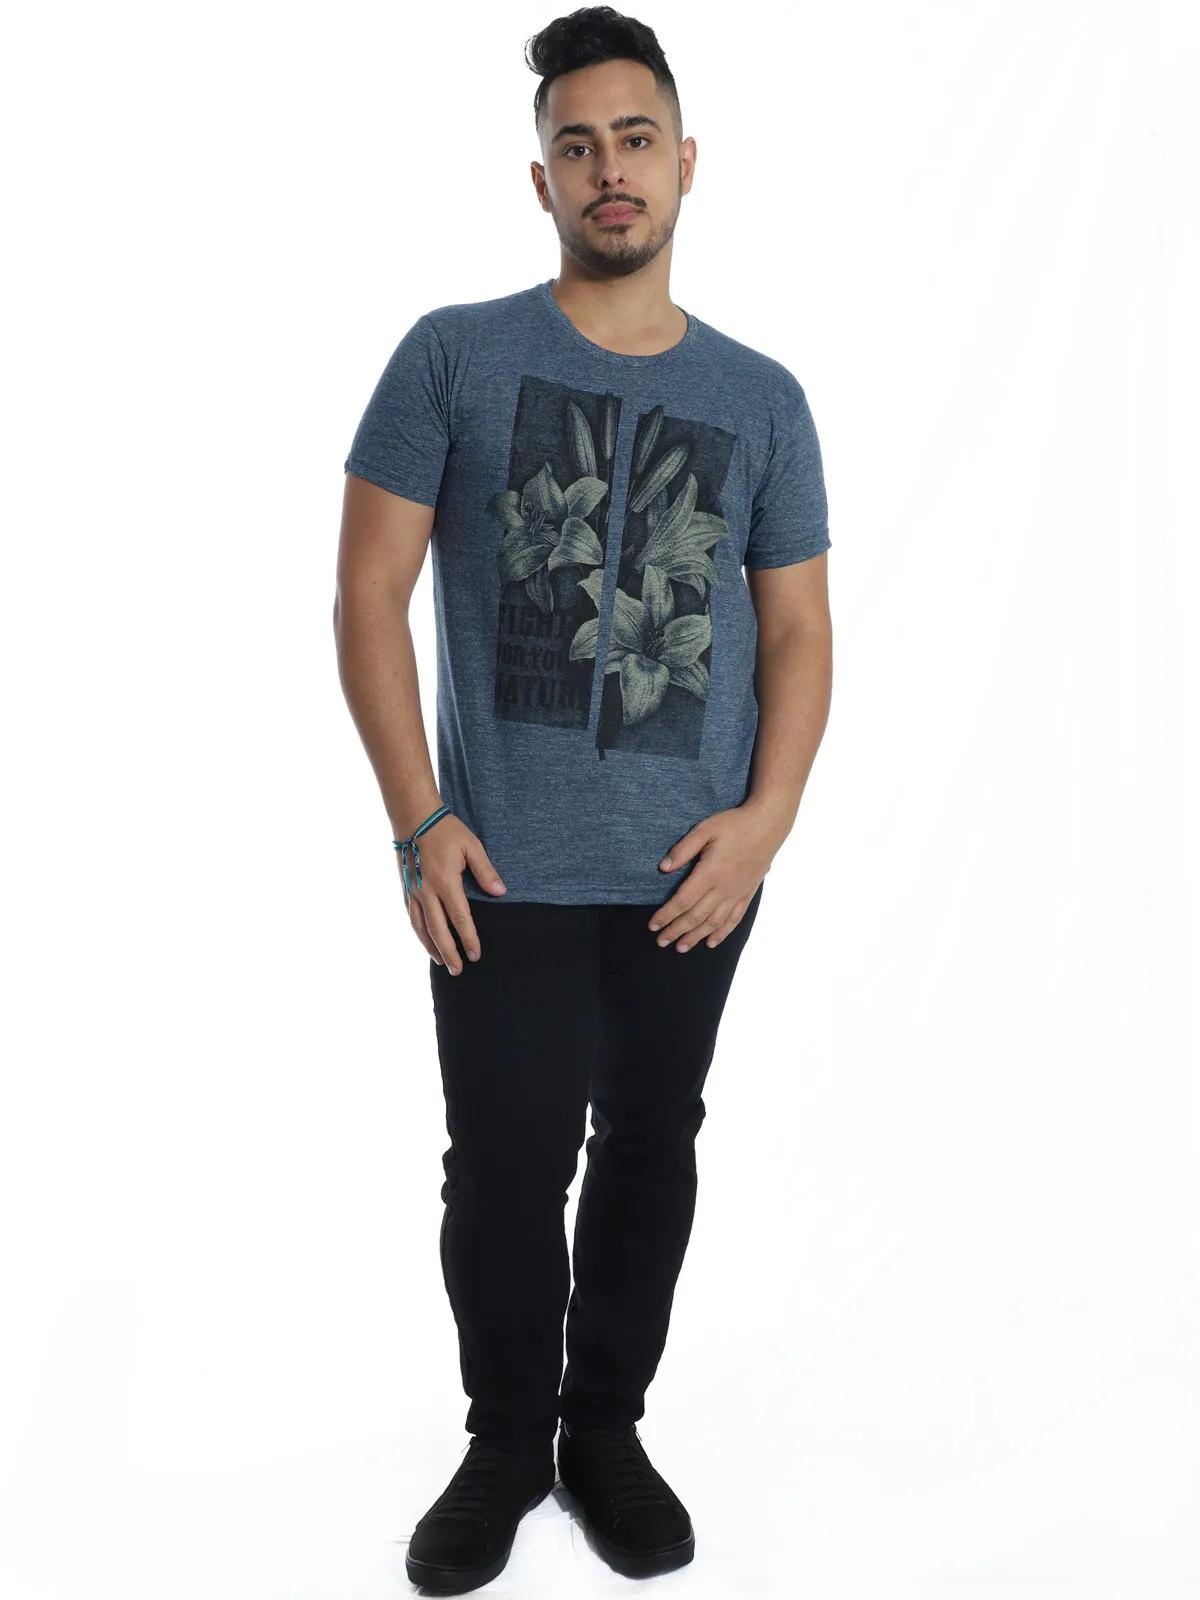 Camiseta Masculina Slim Fit Manga Curta Estampada Granite Azul